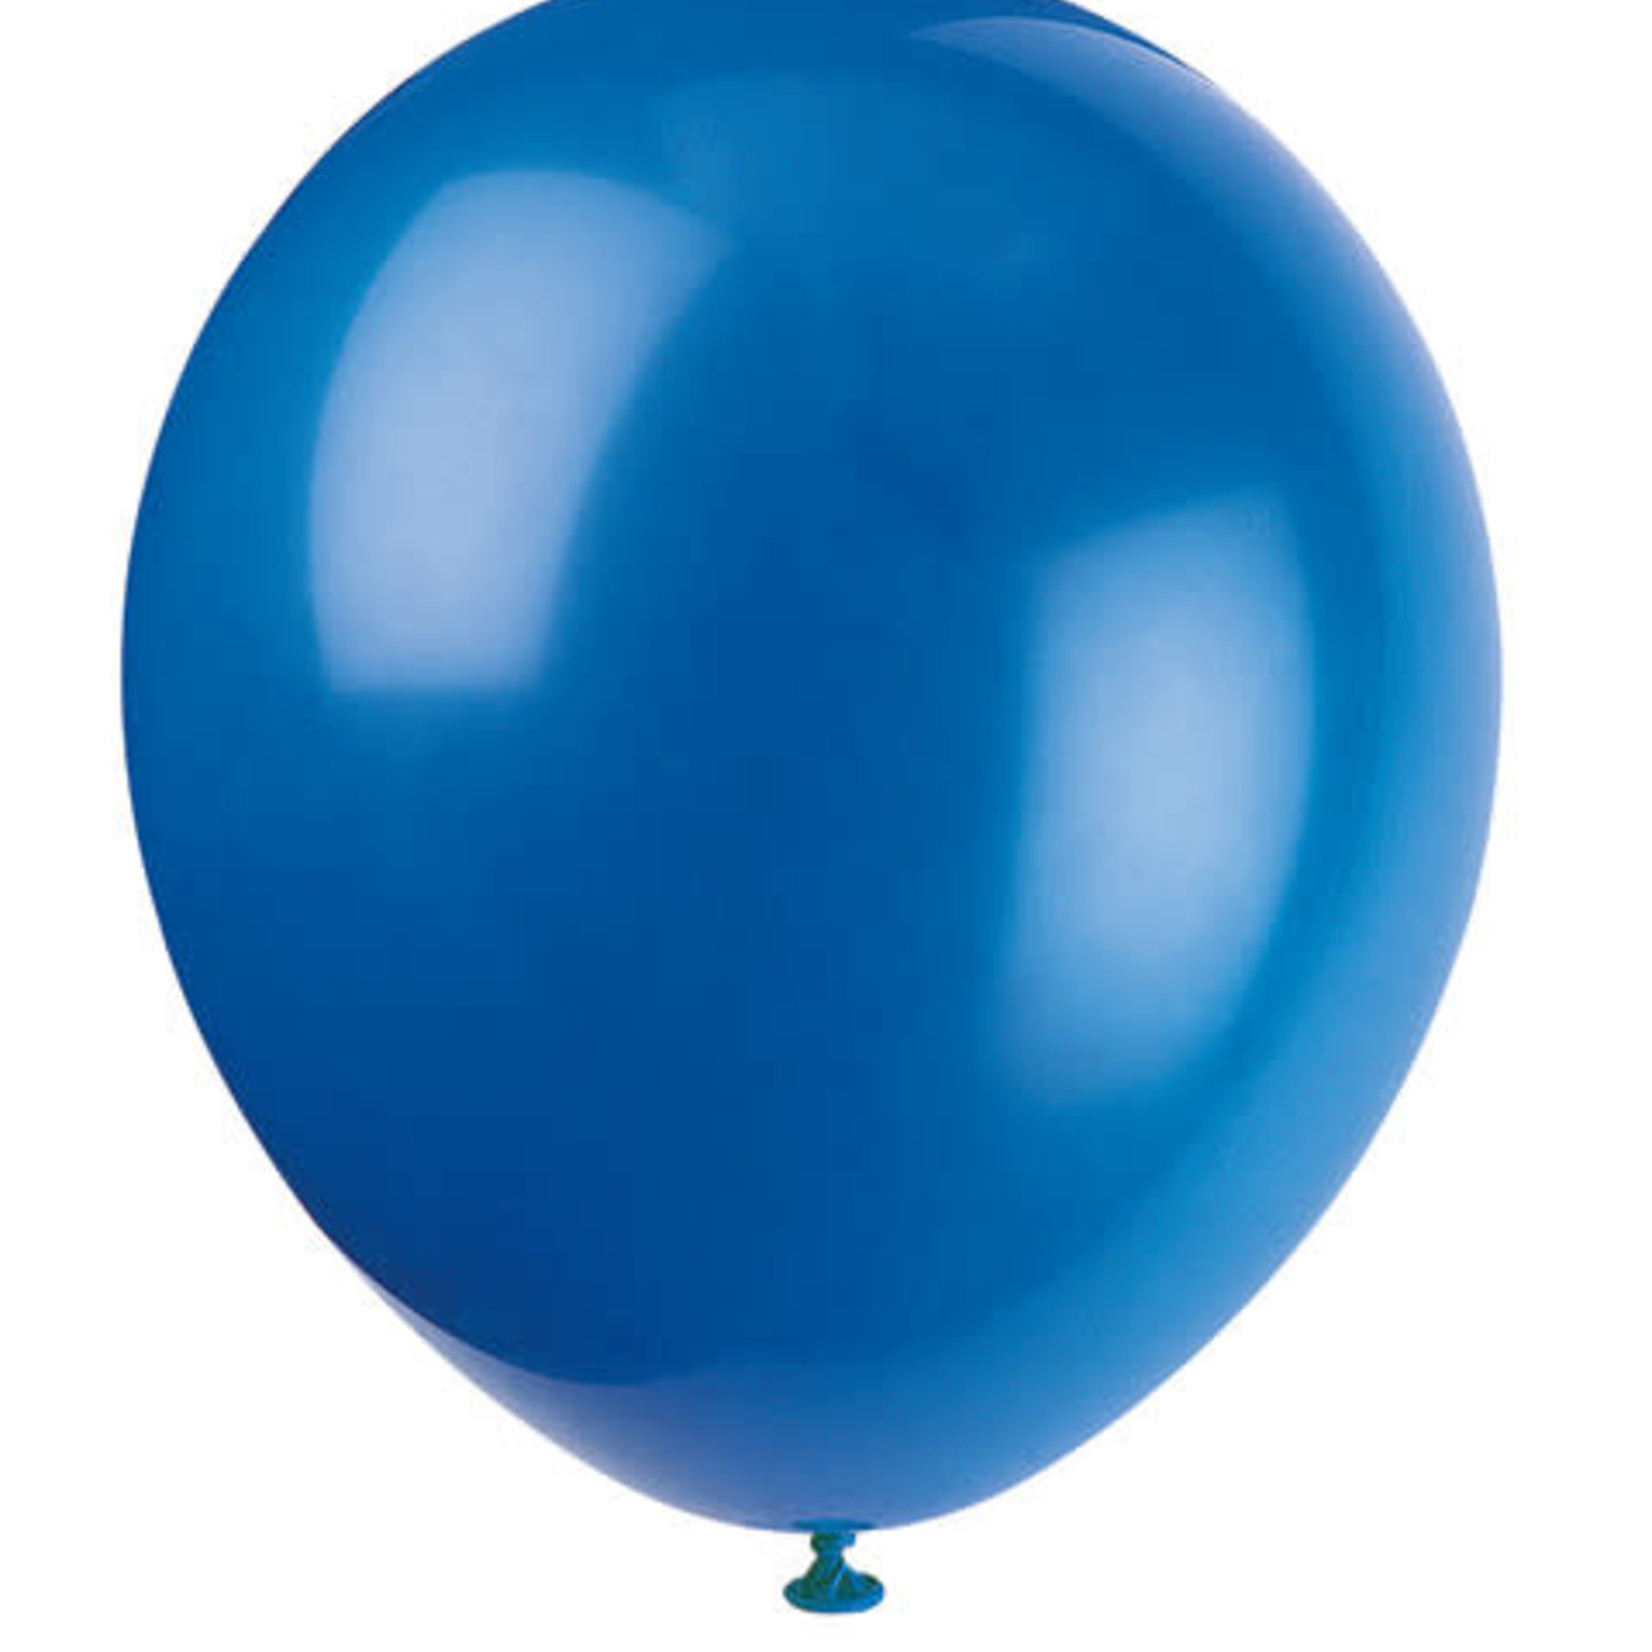 10 12'' ROYAL BLUE BALLOONS